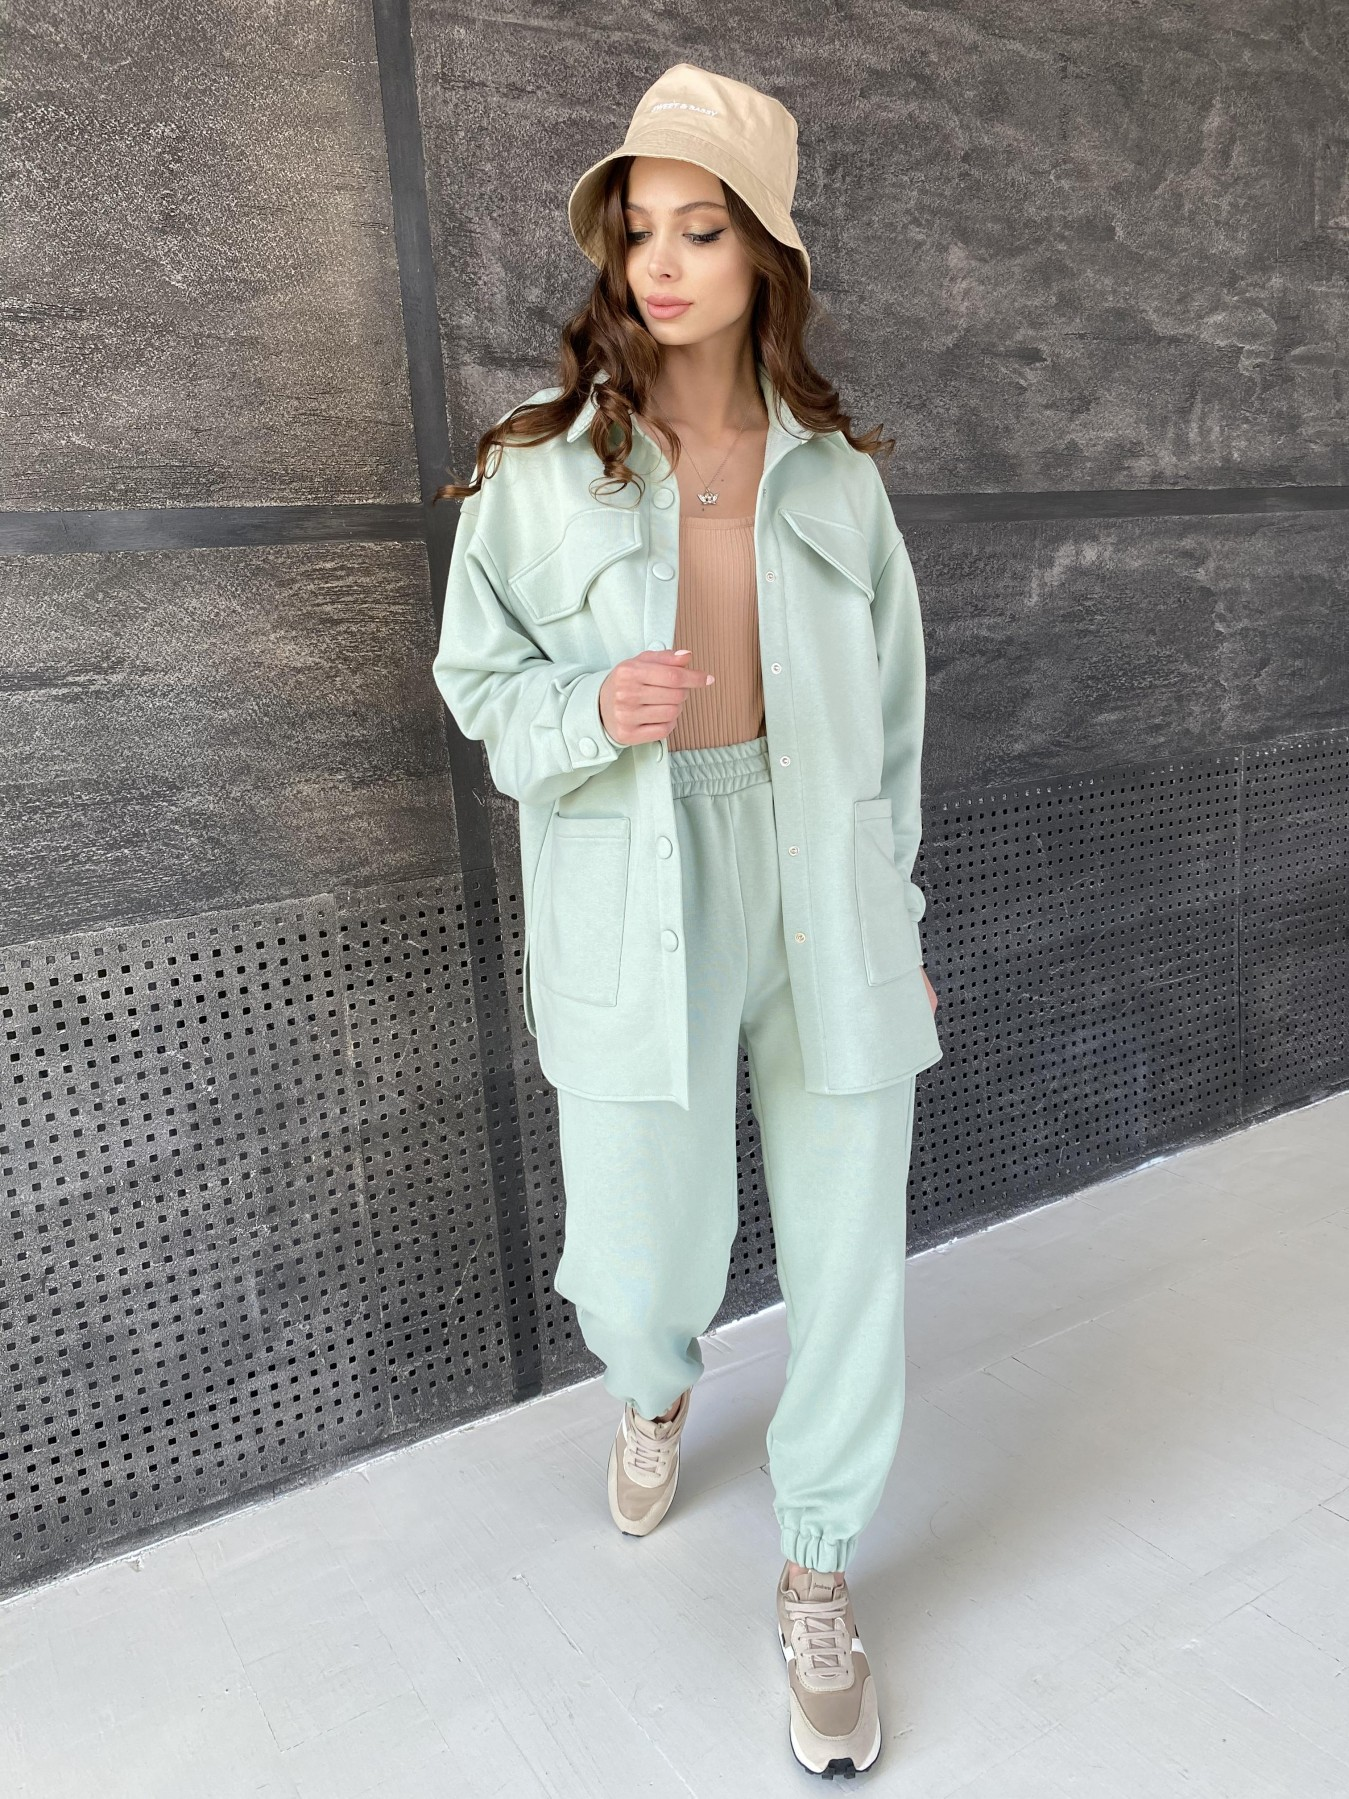 Респект костюм из трикотажа  3х нитка 11055 АРТ. 47576 Цвет: Олива Светлая - фото 6, интернет магазин tm-modus.ru